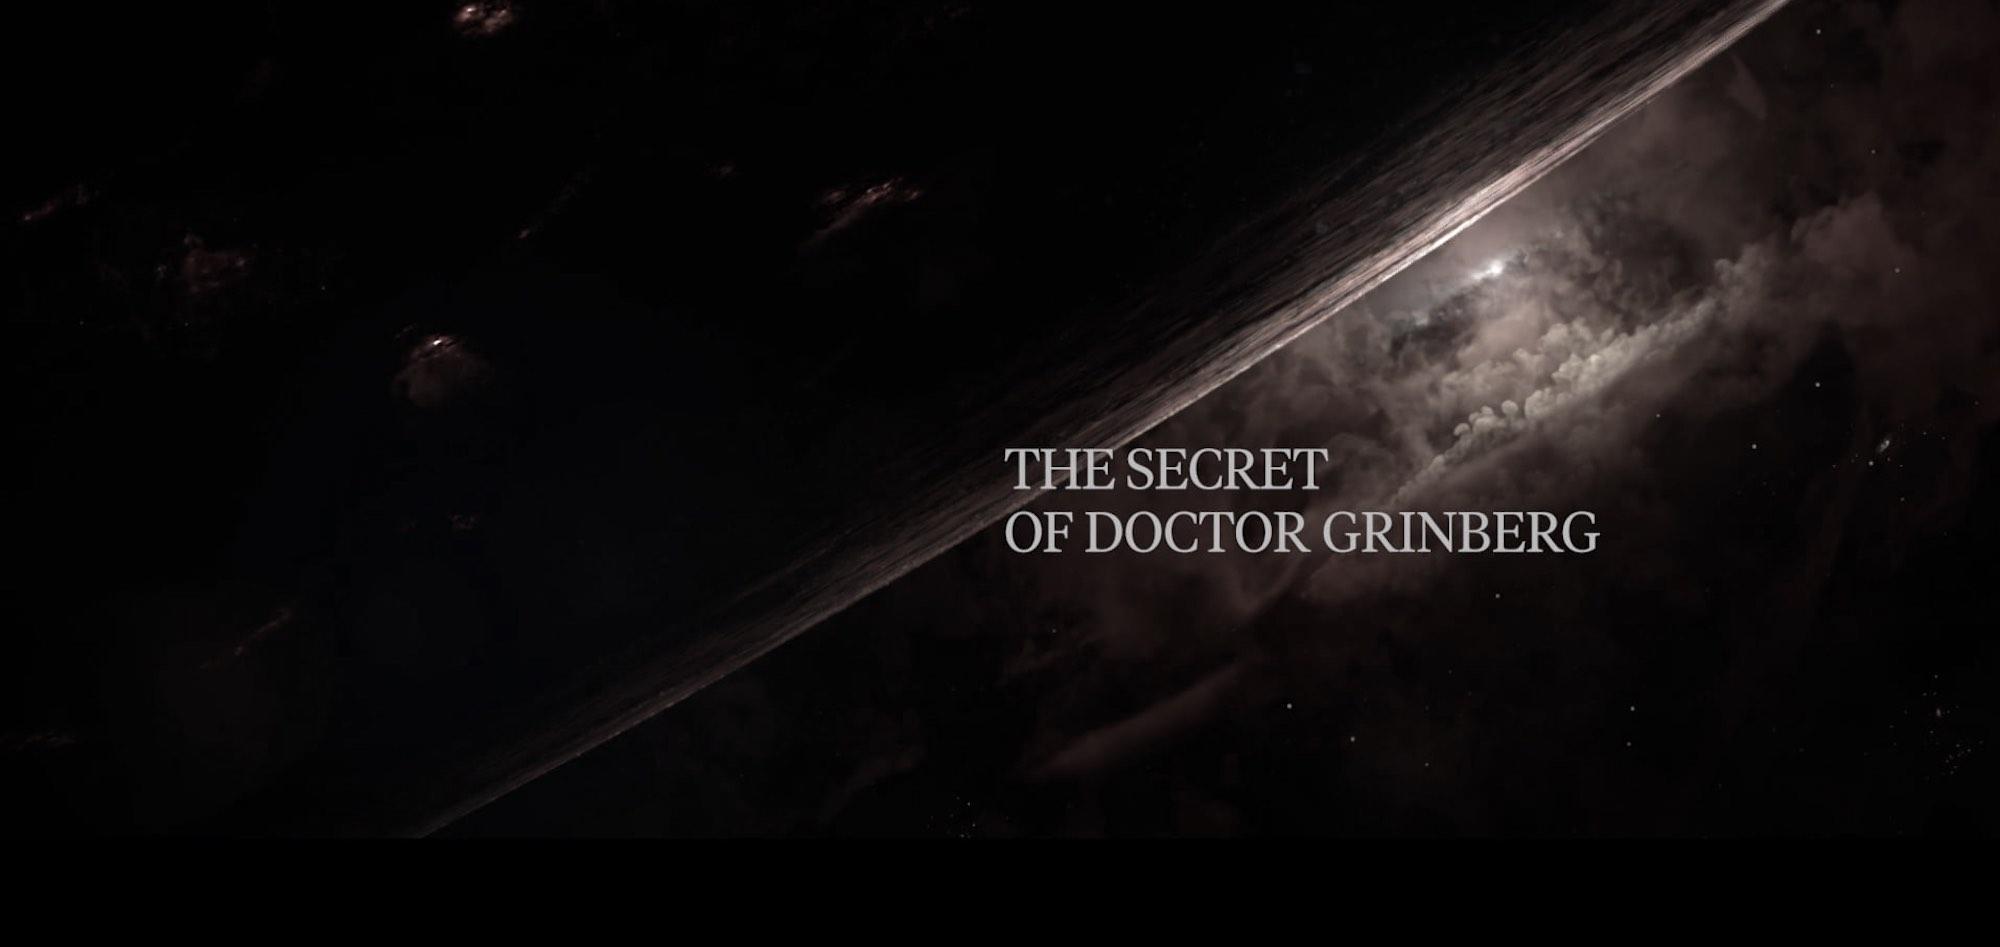 El secreto del doctor Grinberg [Documental]